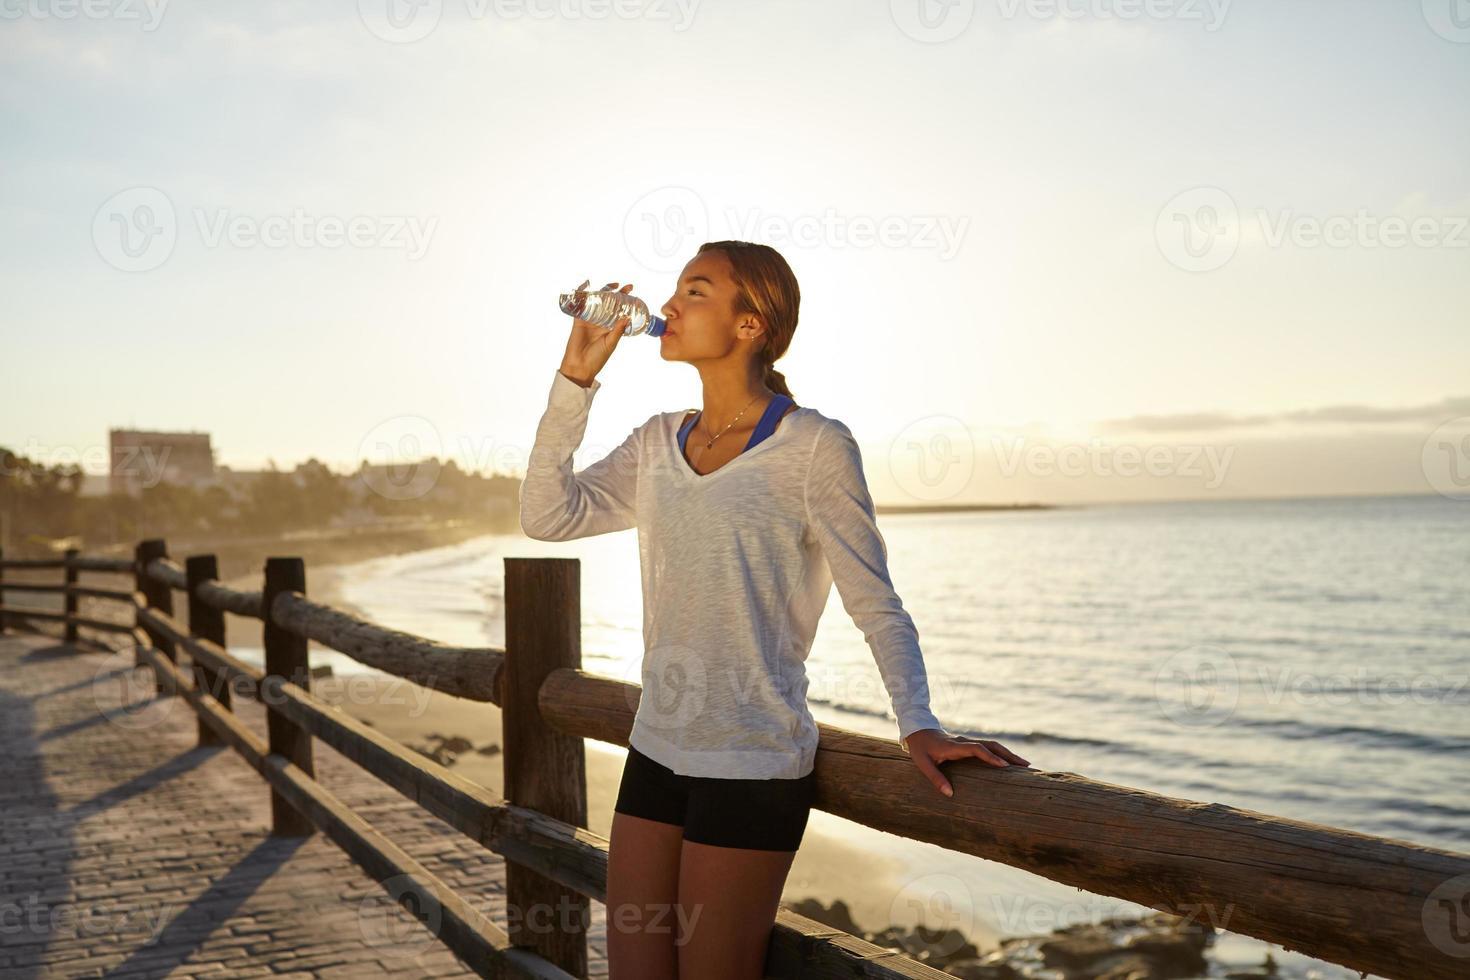 ung jogger som dricker en energidryck foto